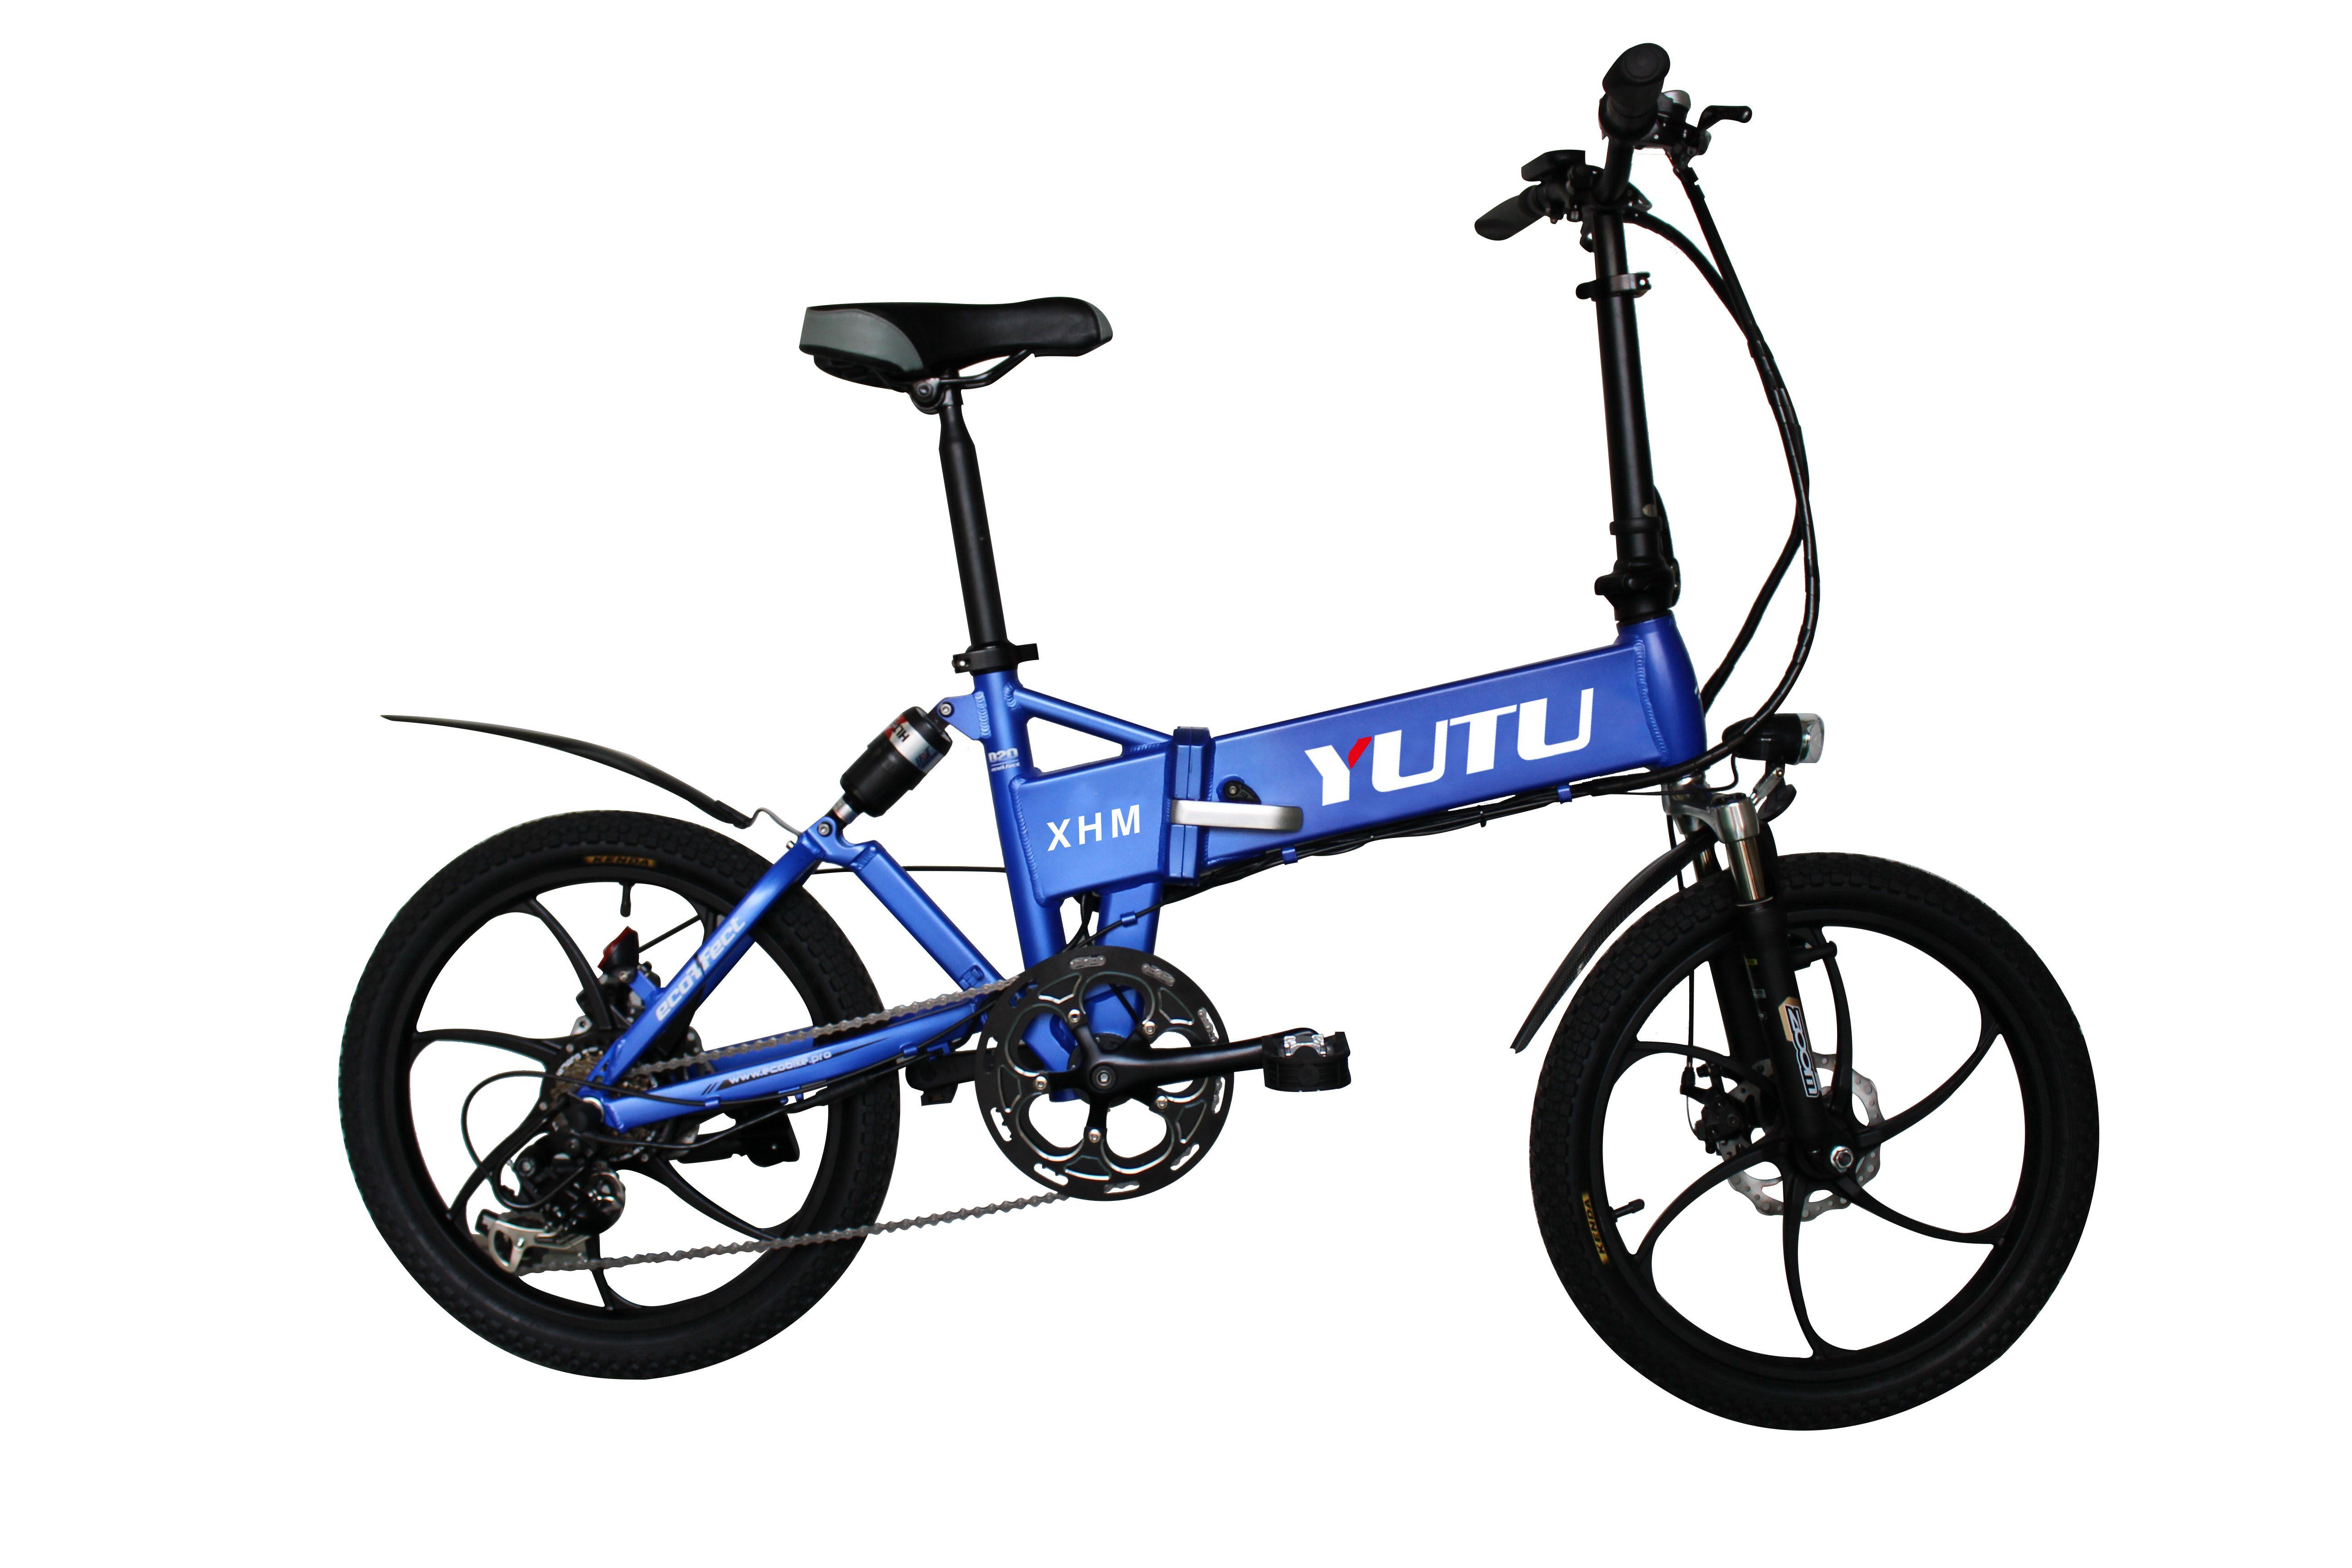 20 Electric Folding Bike 36v 9ah Samsung Core Lithium Battery